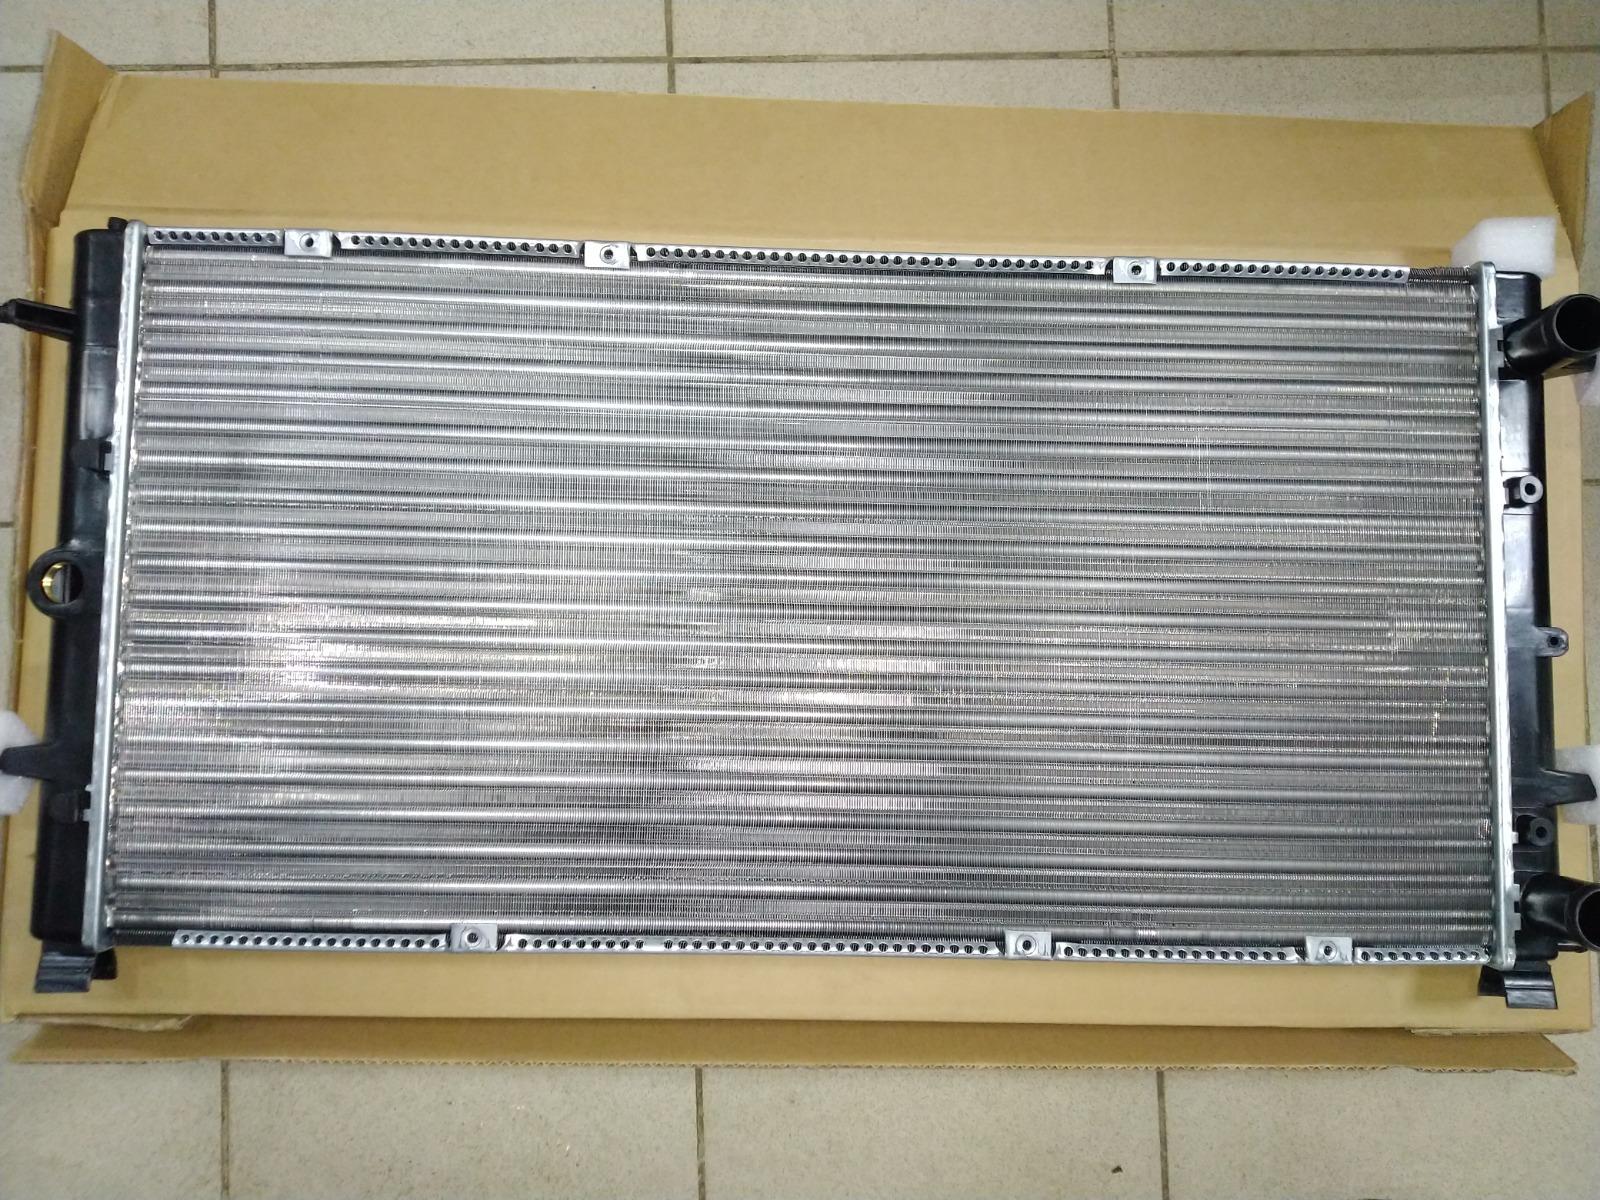 Радиатор охлаждения Volkswagen Transporter T4 1990